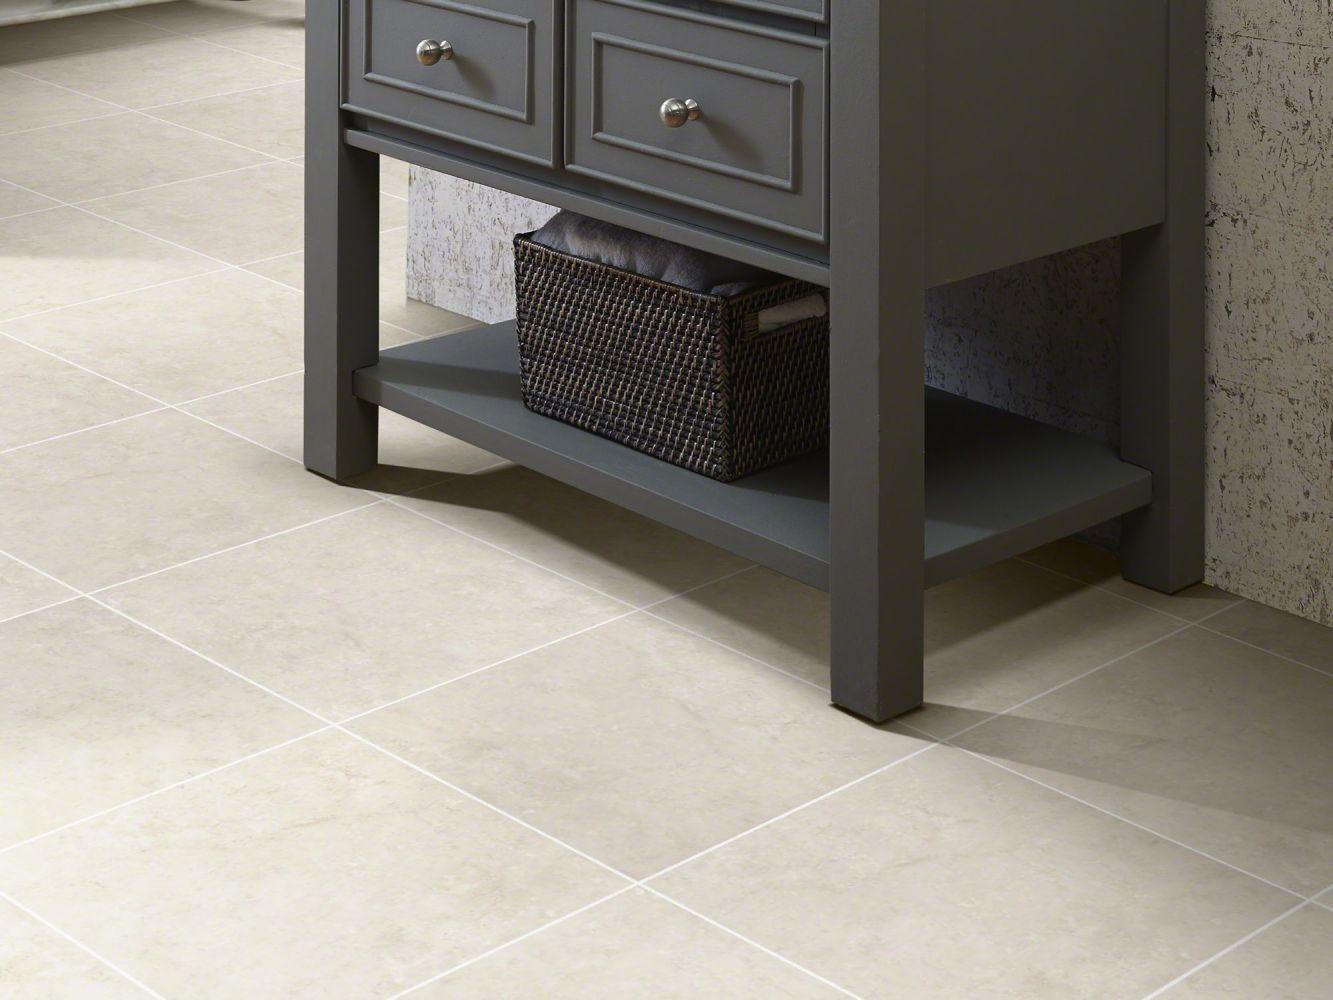 Shaw Floors Resilient Residential Renaissance Ash 00500_0331V